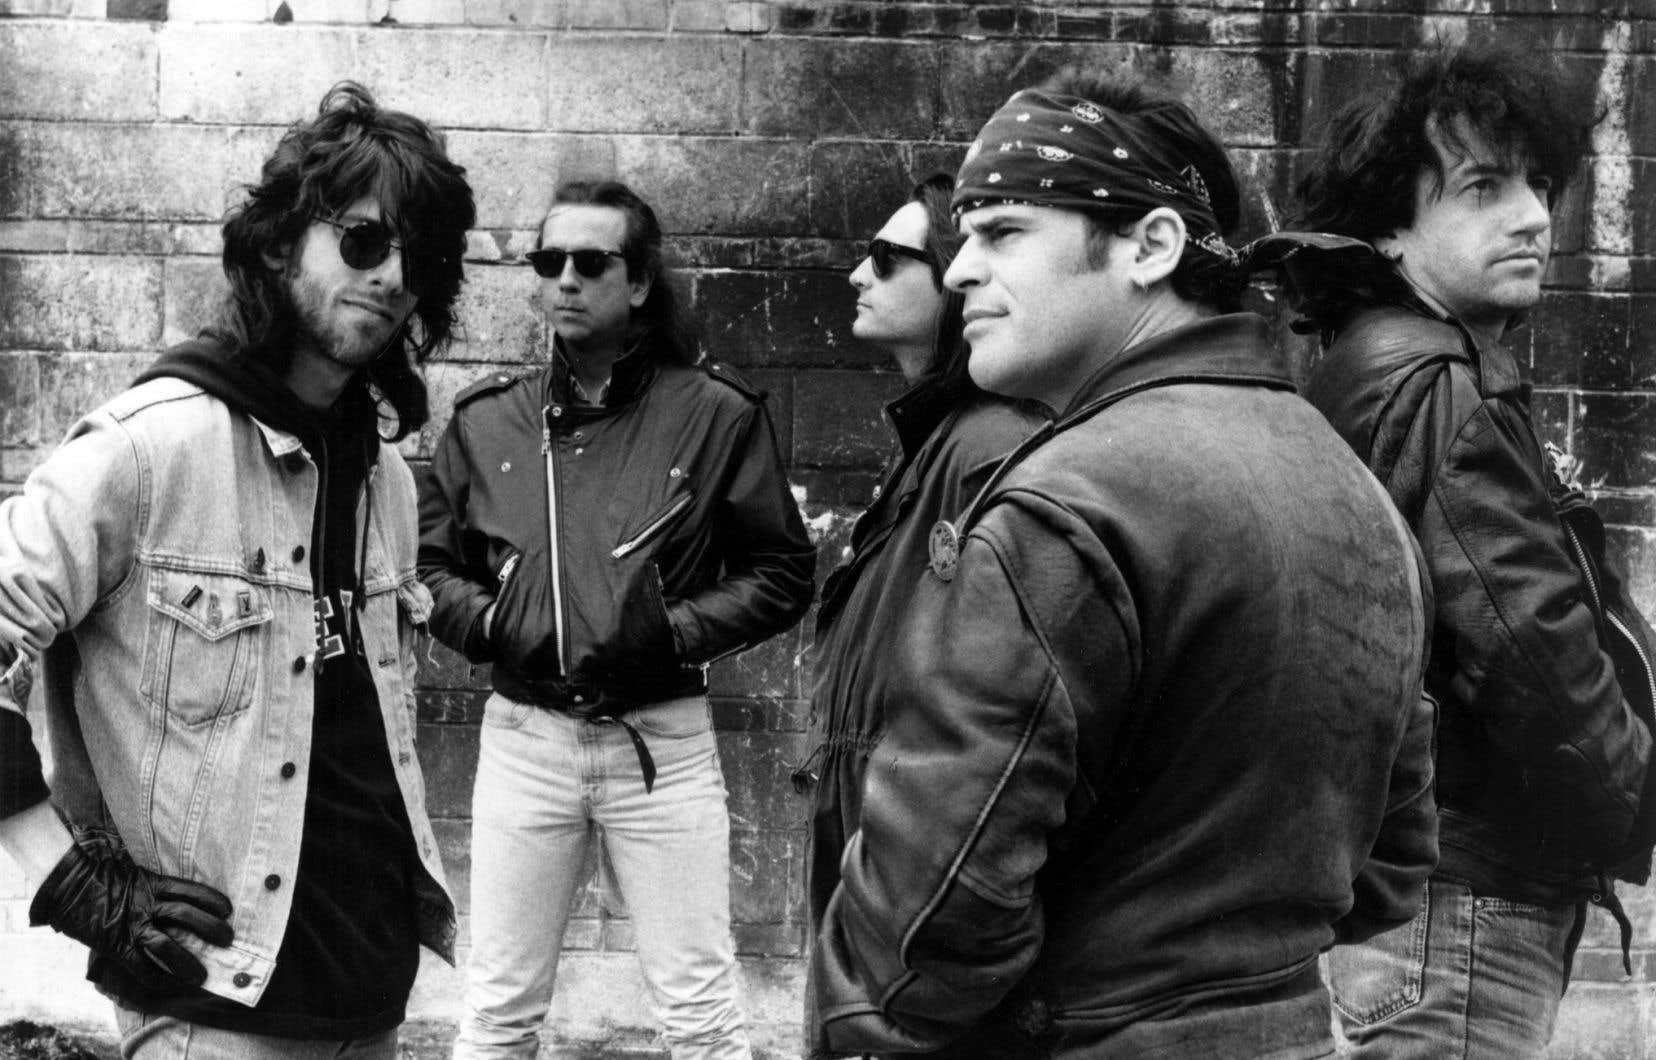 Le groupe Vilain Pingouin, en 1993